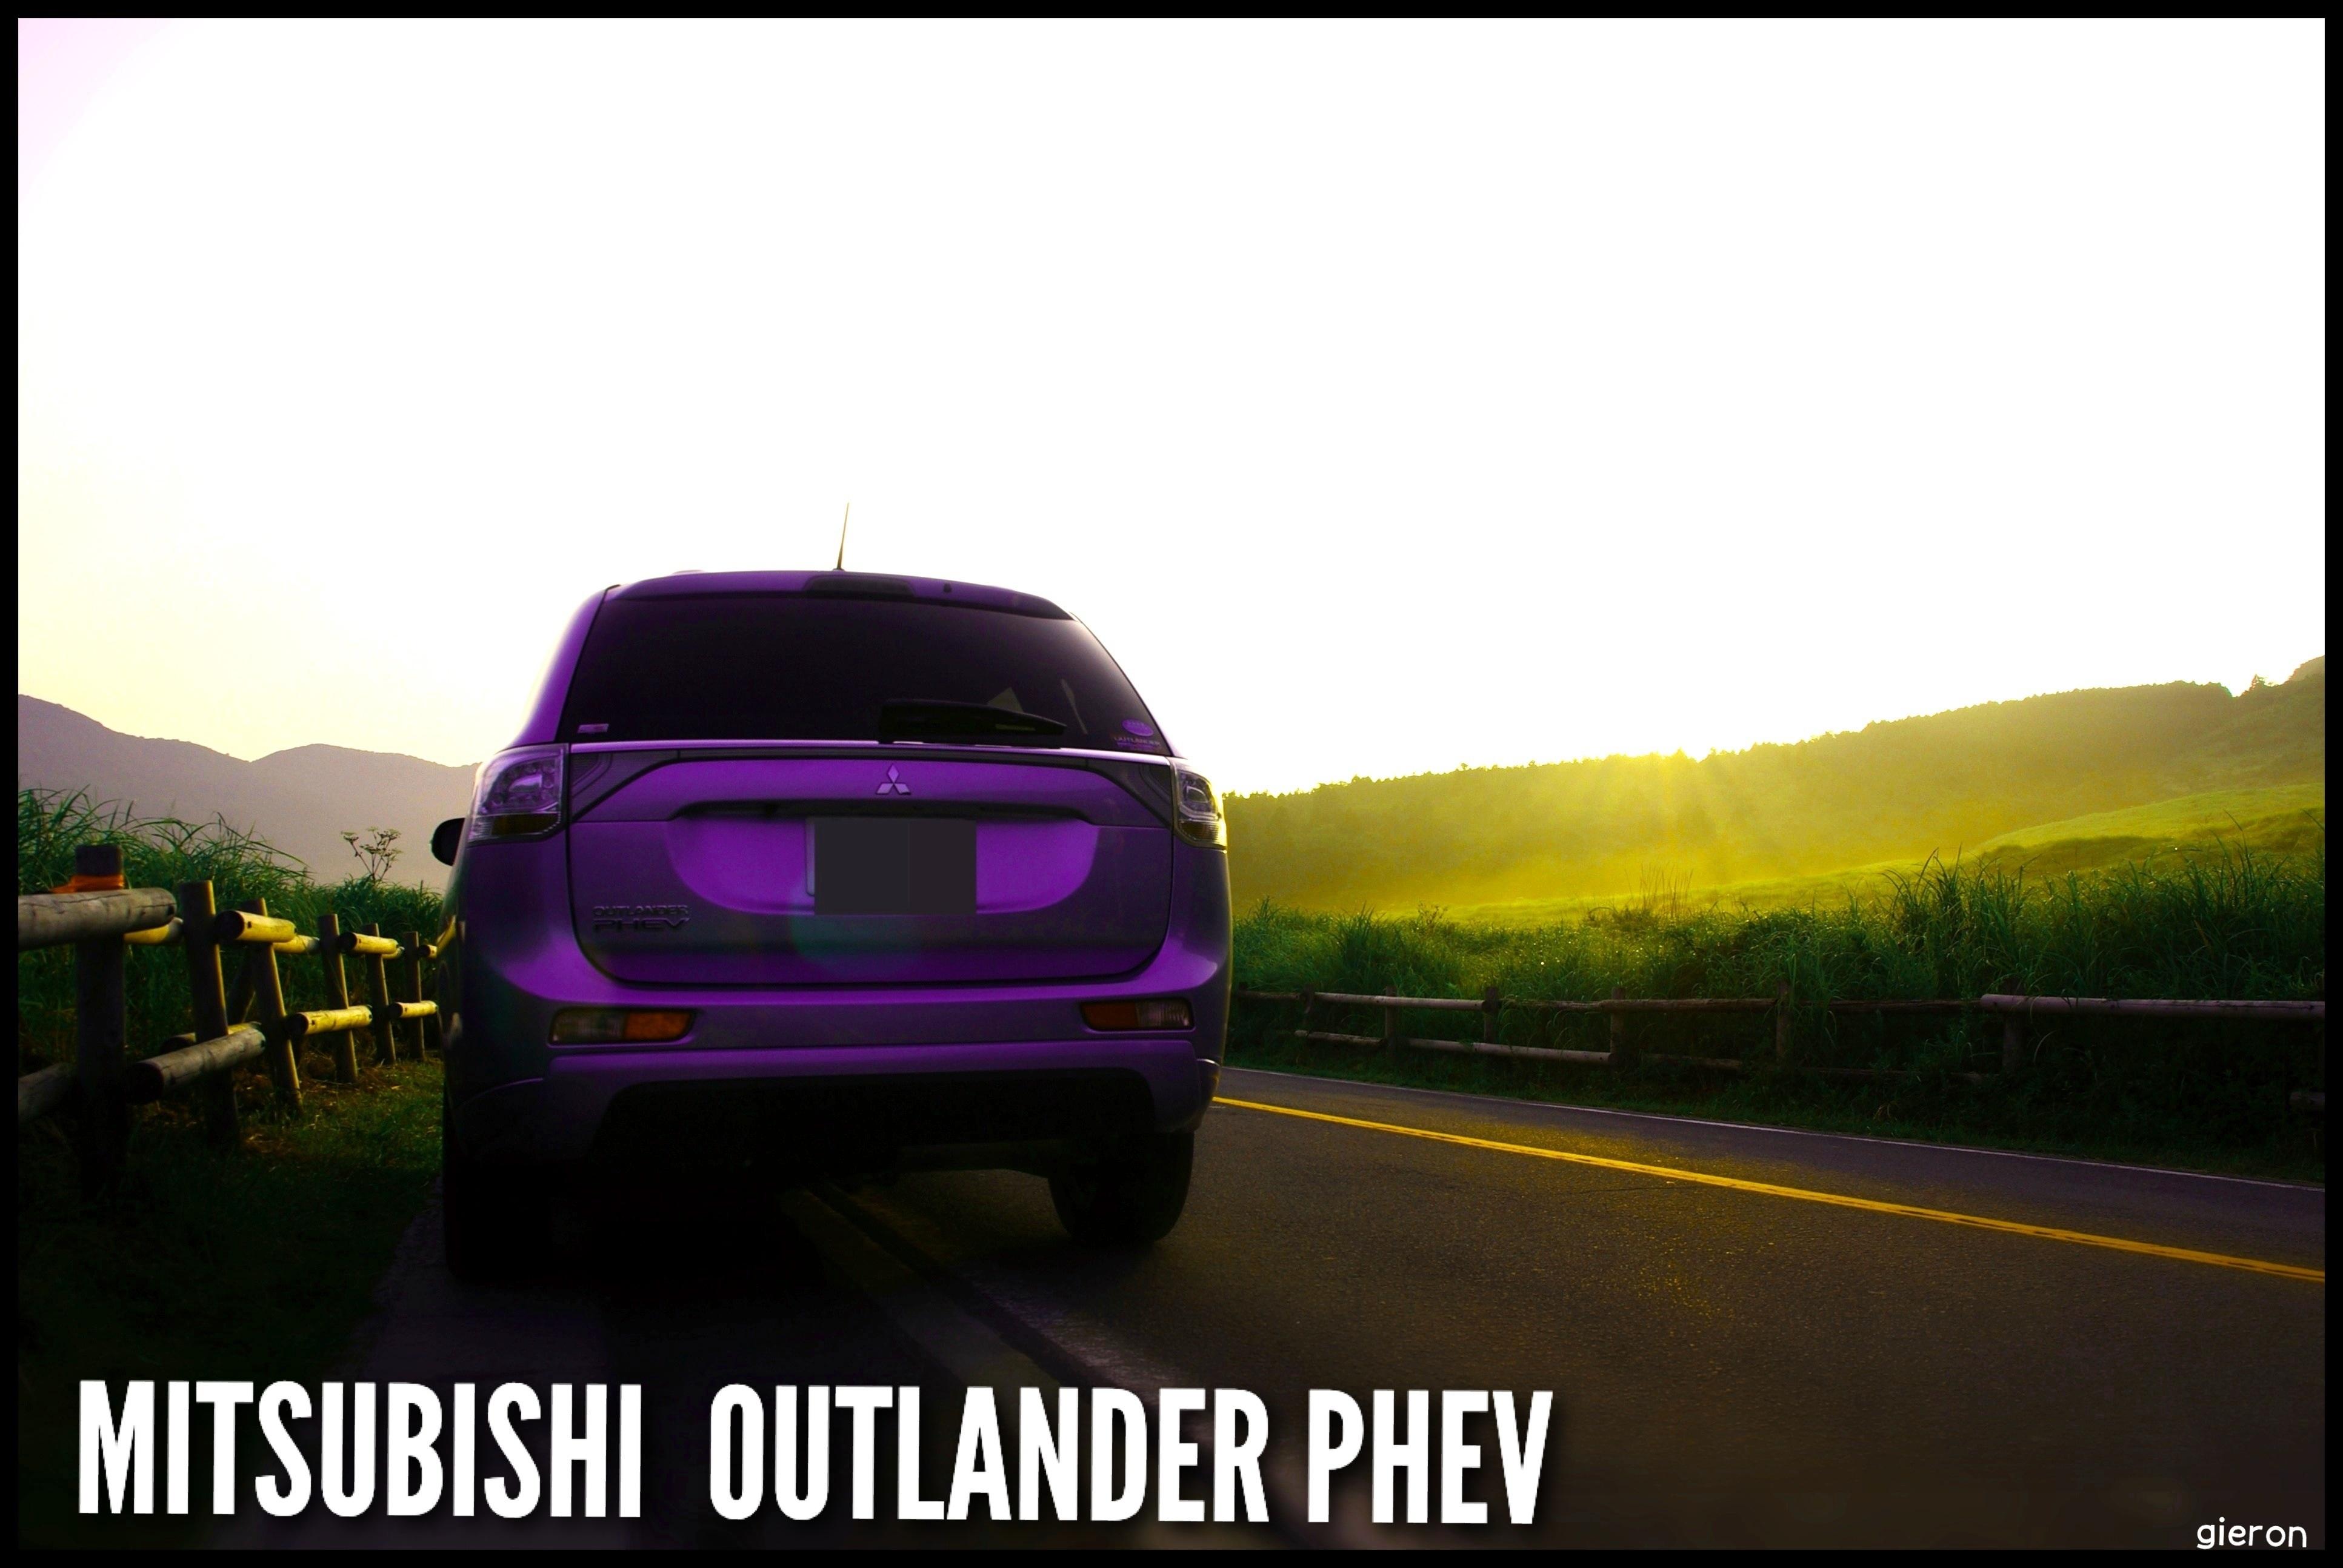 Outlander phev